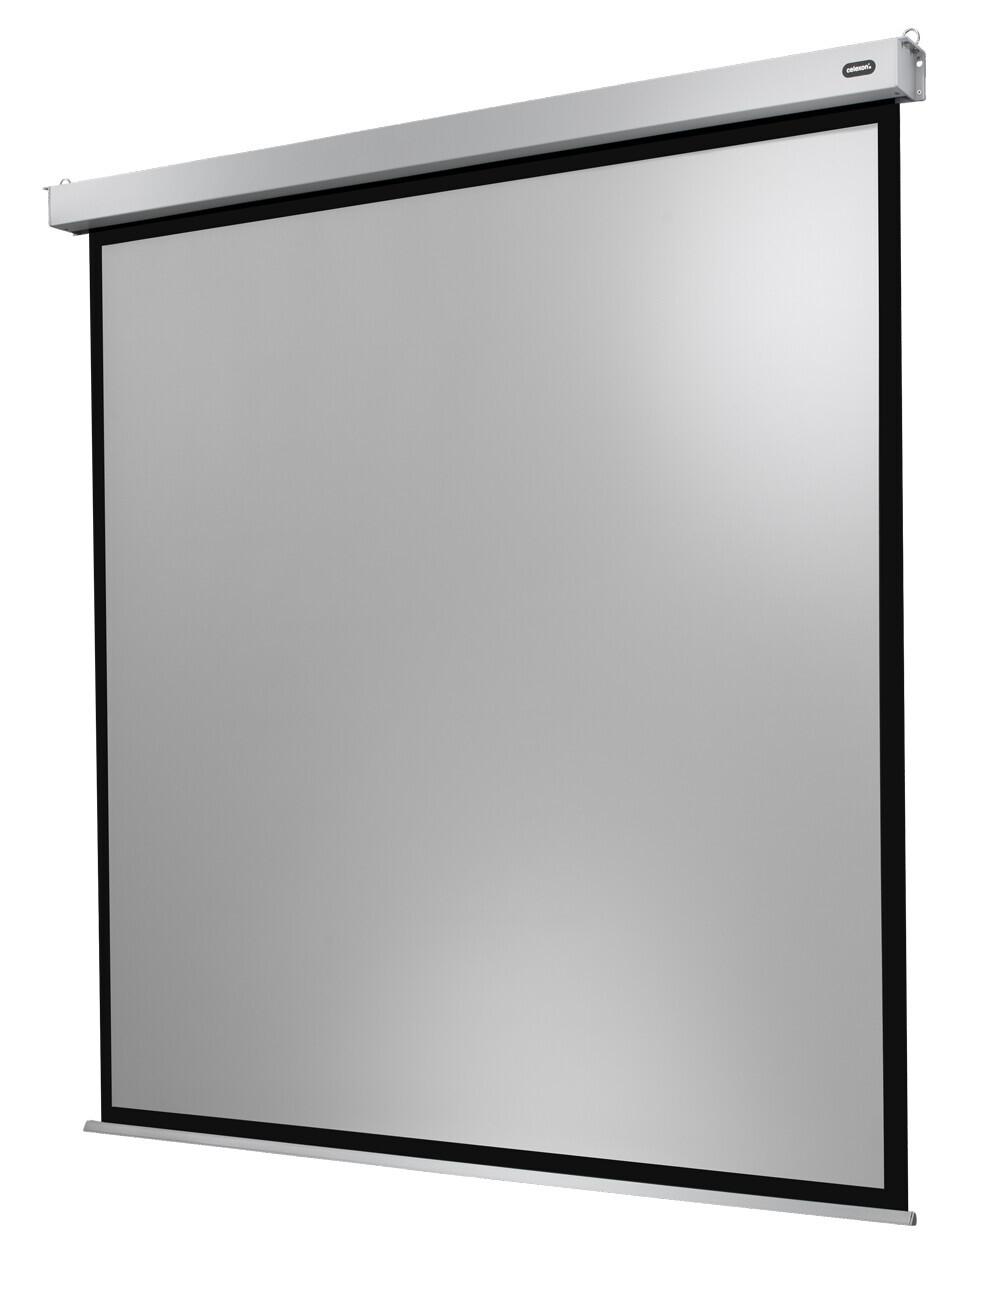 Celexon Electric Professional Plus Screen 300 x 300 cm